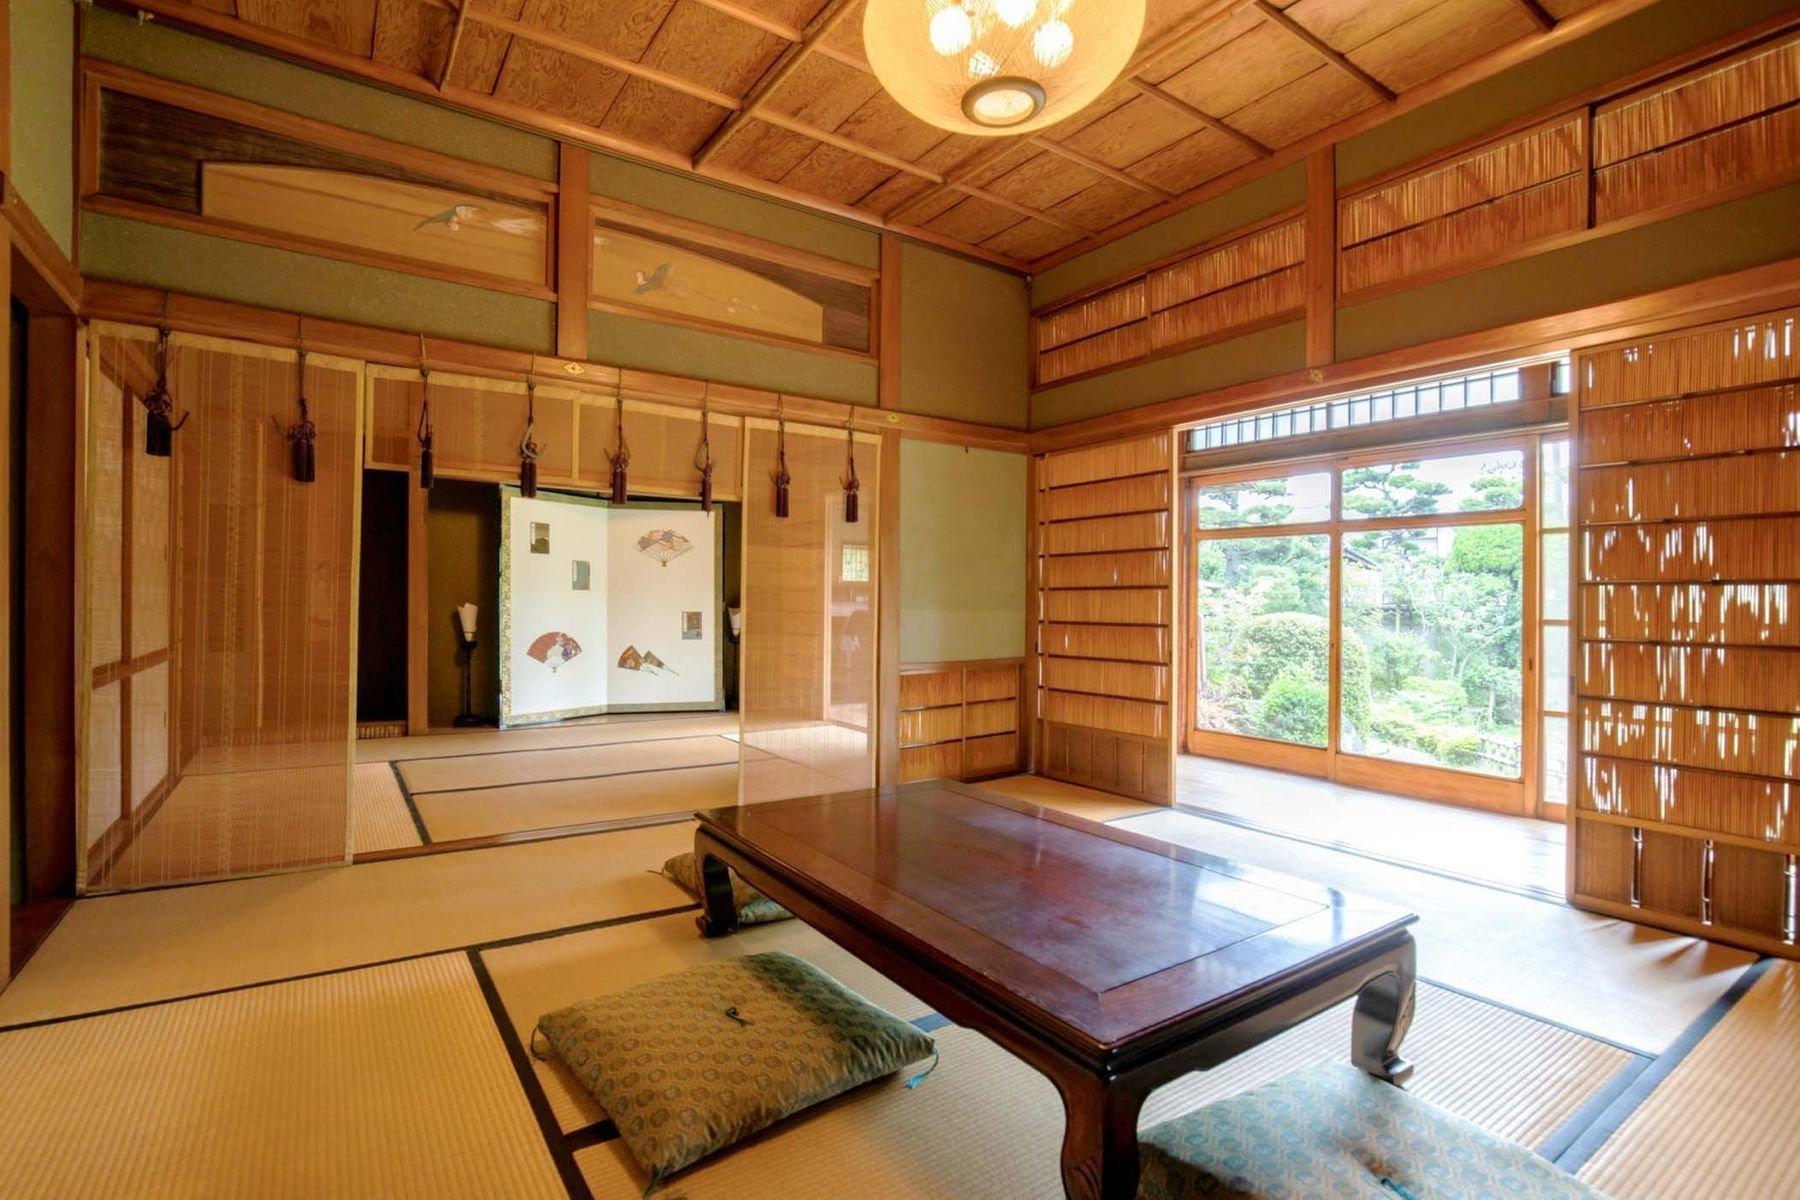 House in 8, Osaka, Japan 1